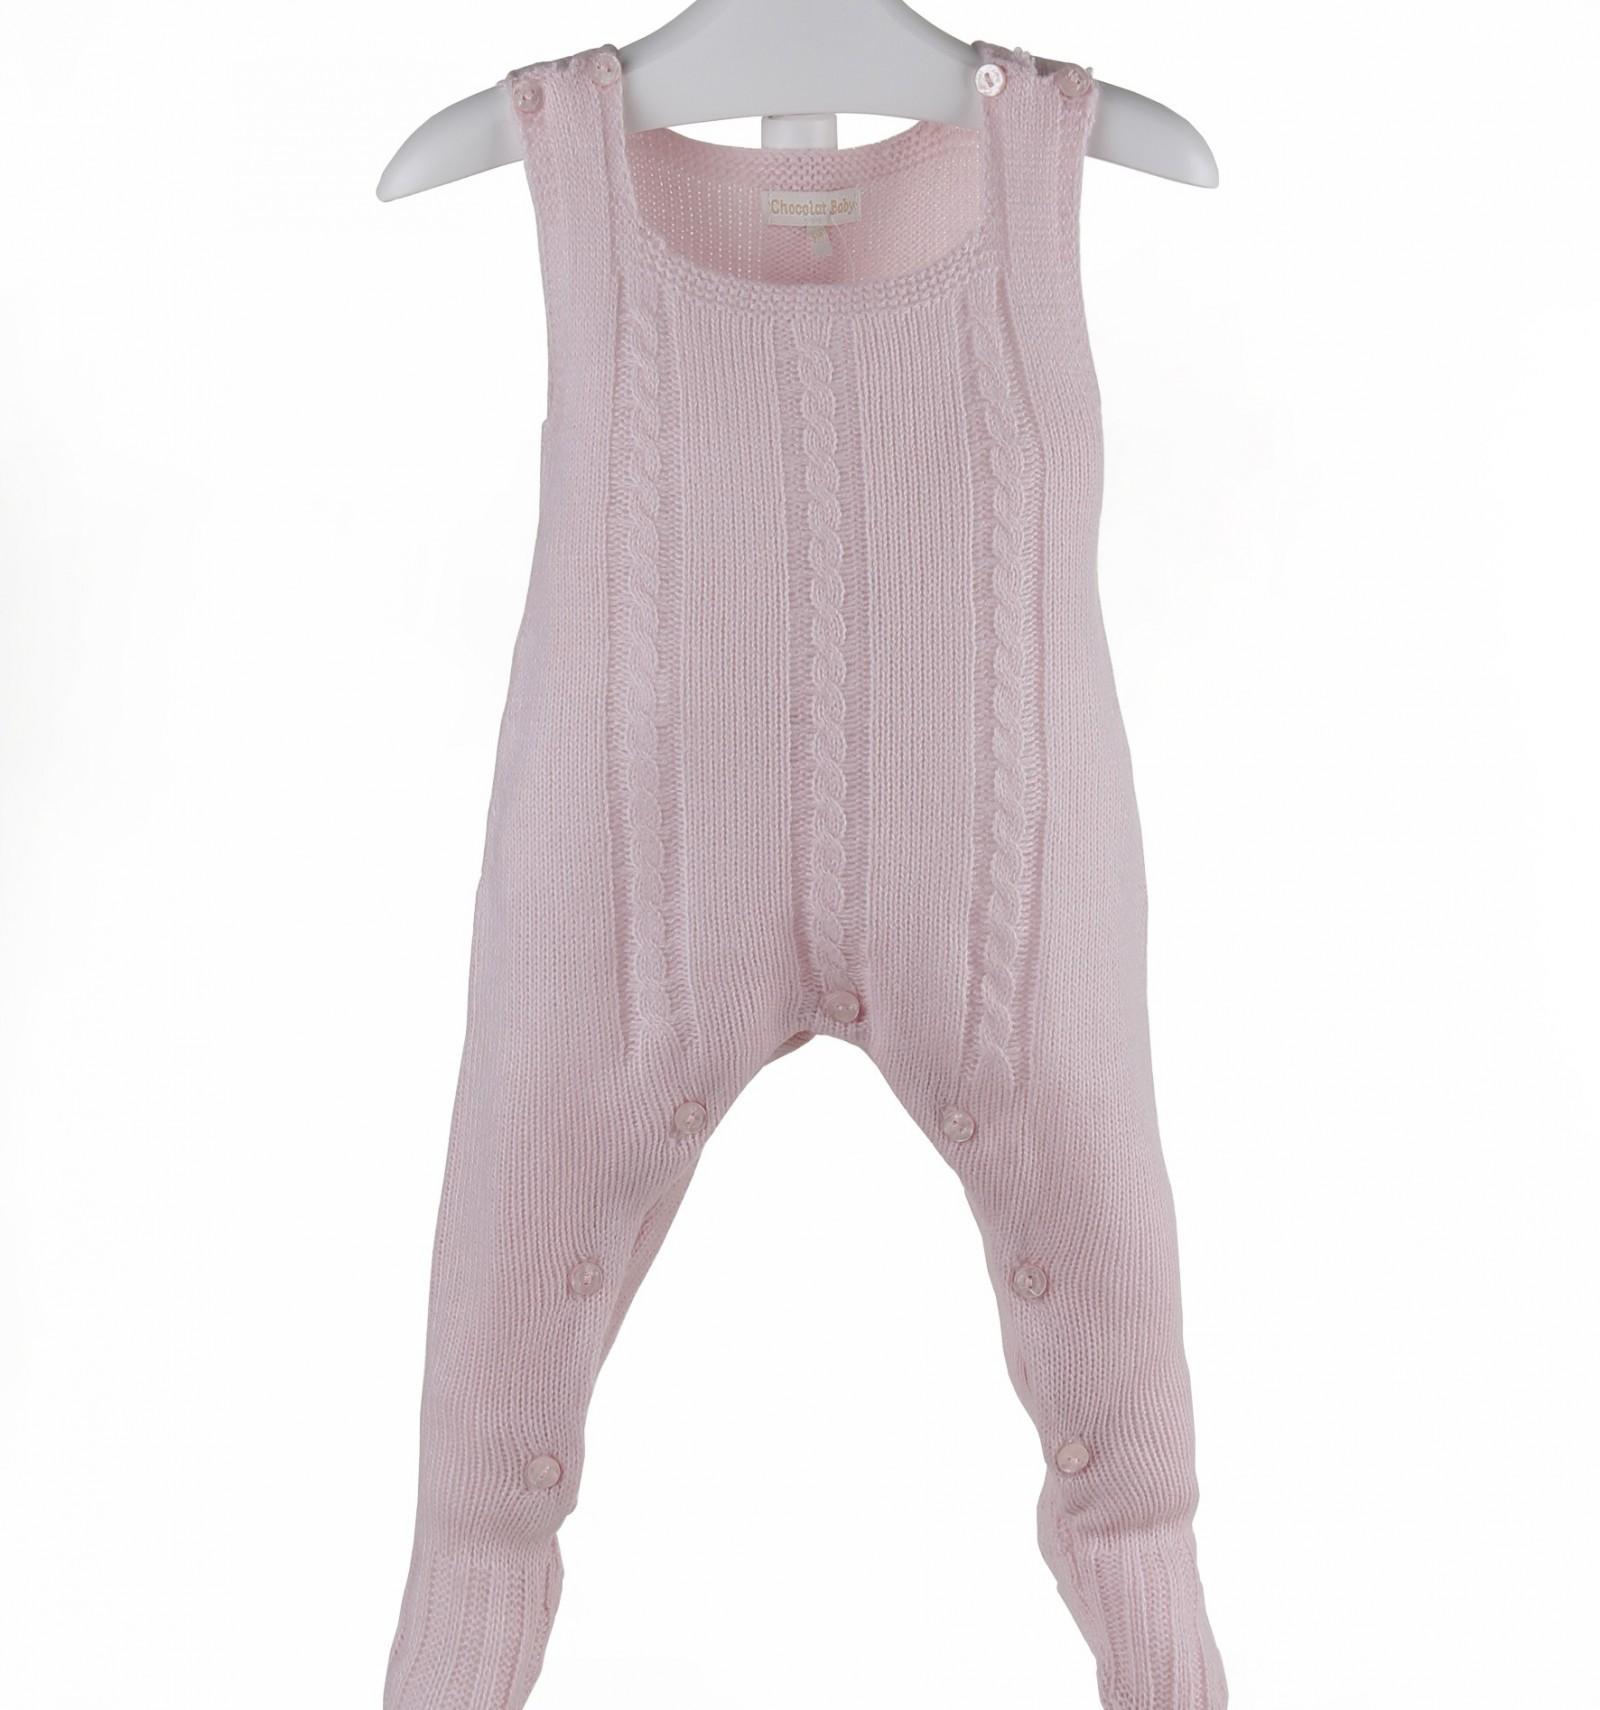 6a44840f5 Pelele de bebé de lana de tirantes